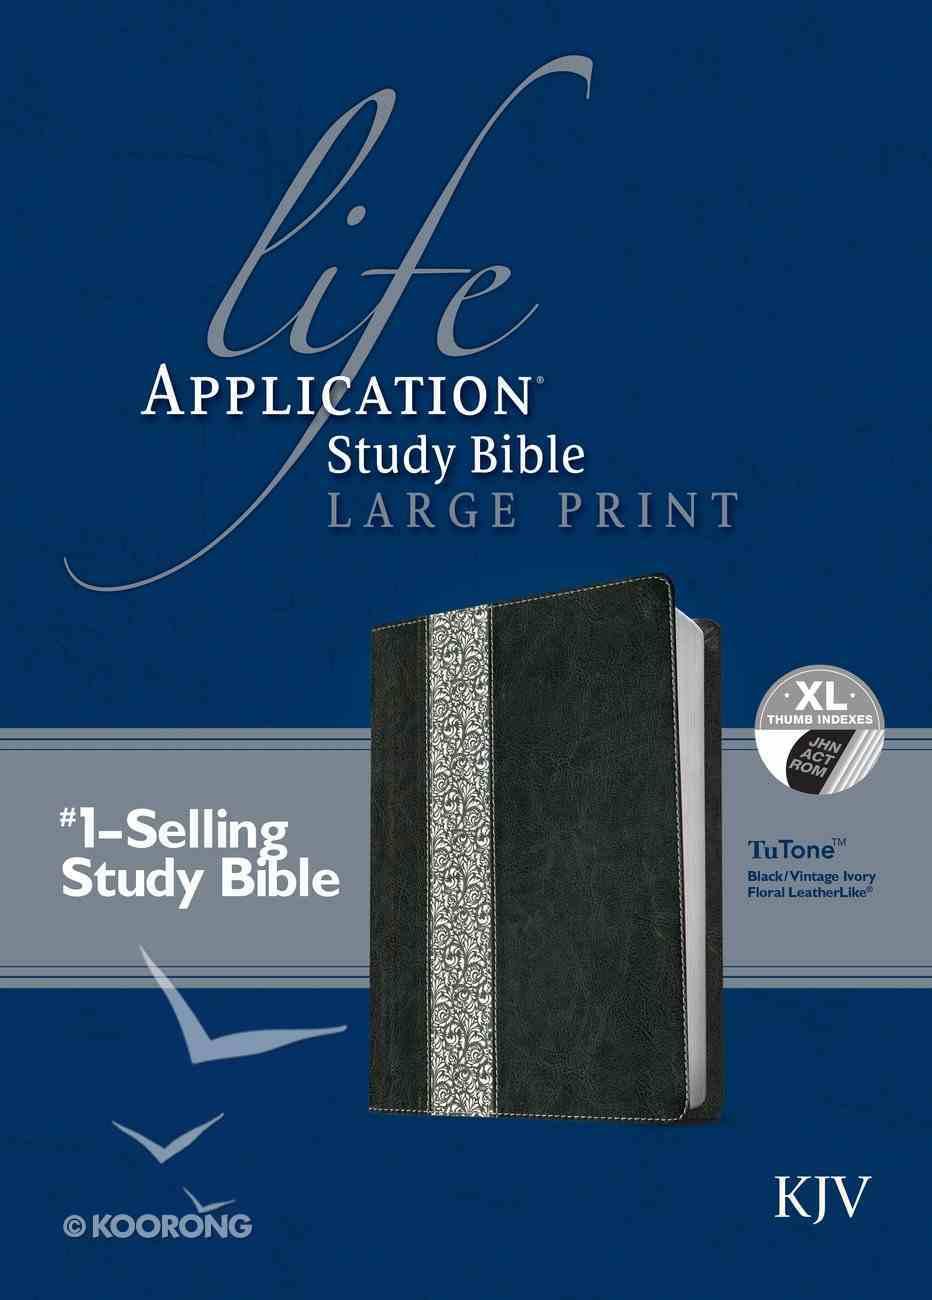 KJV Large Print Life Application Study Bible Indexed Black/Vintage Ivory Floral (Red Letter Edition) Imitation Leather